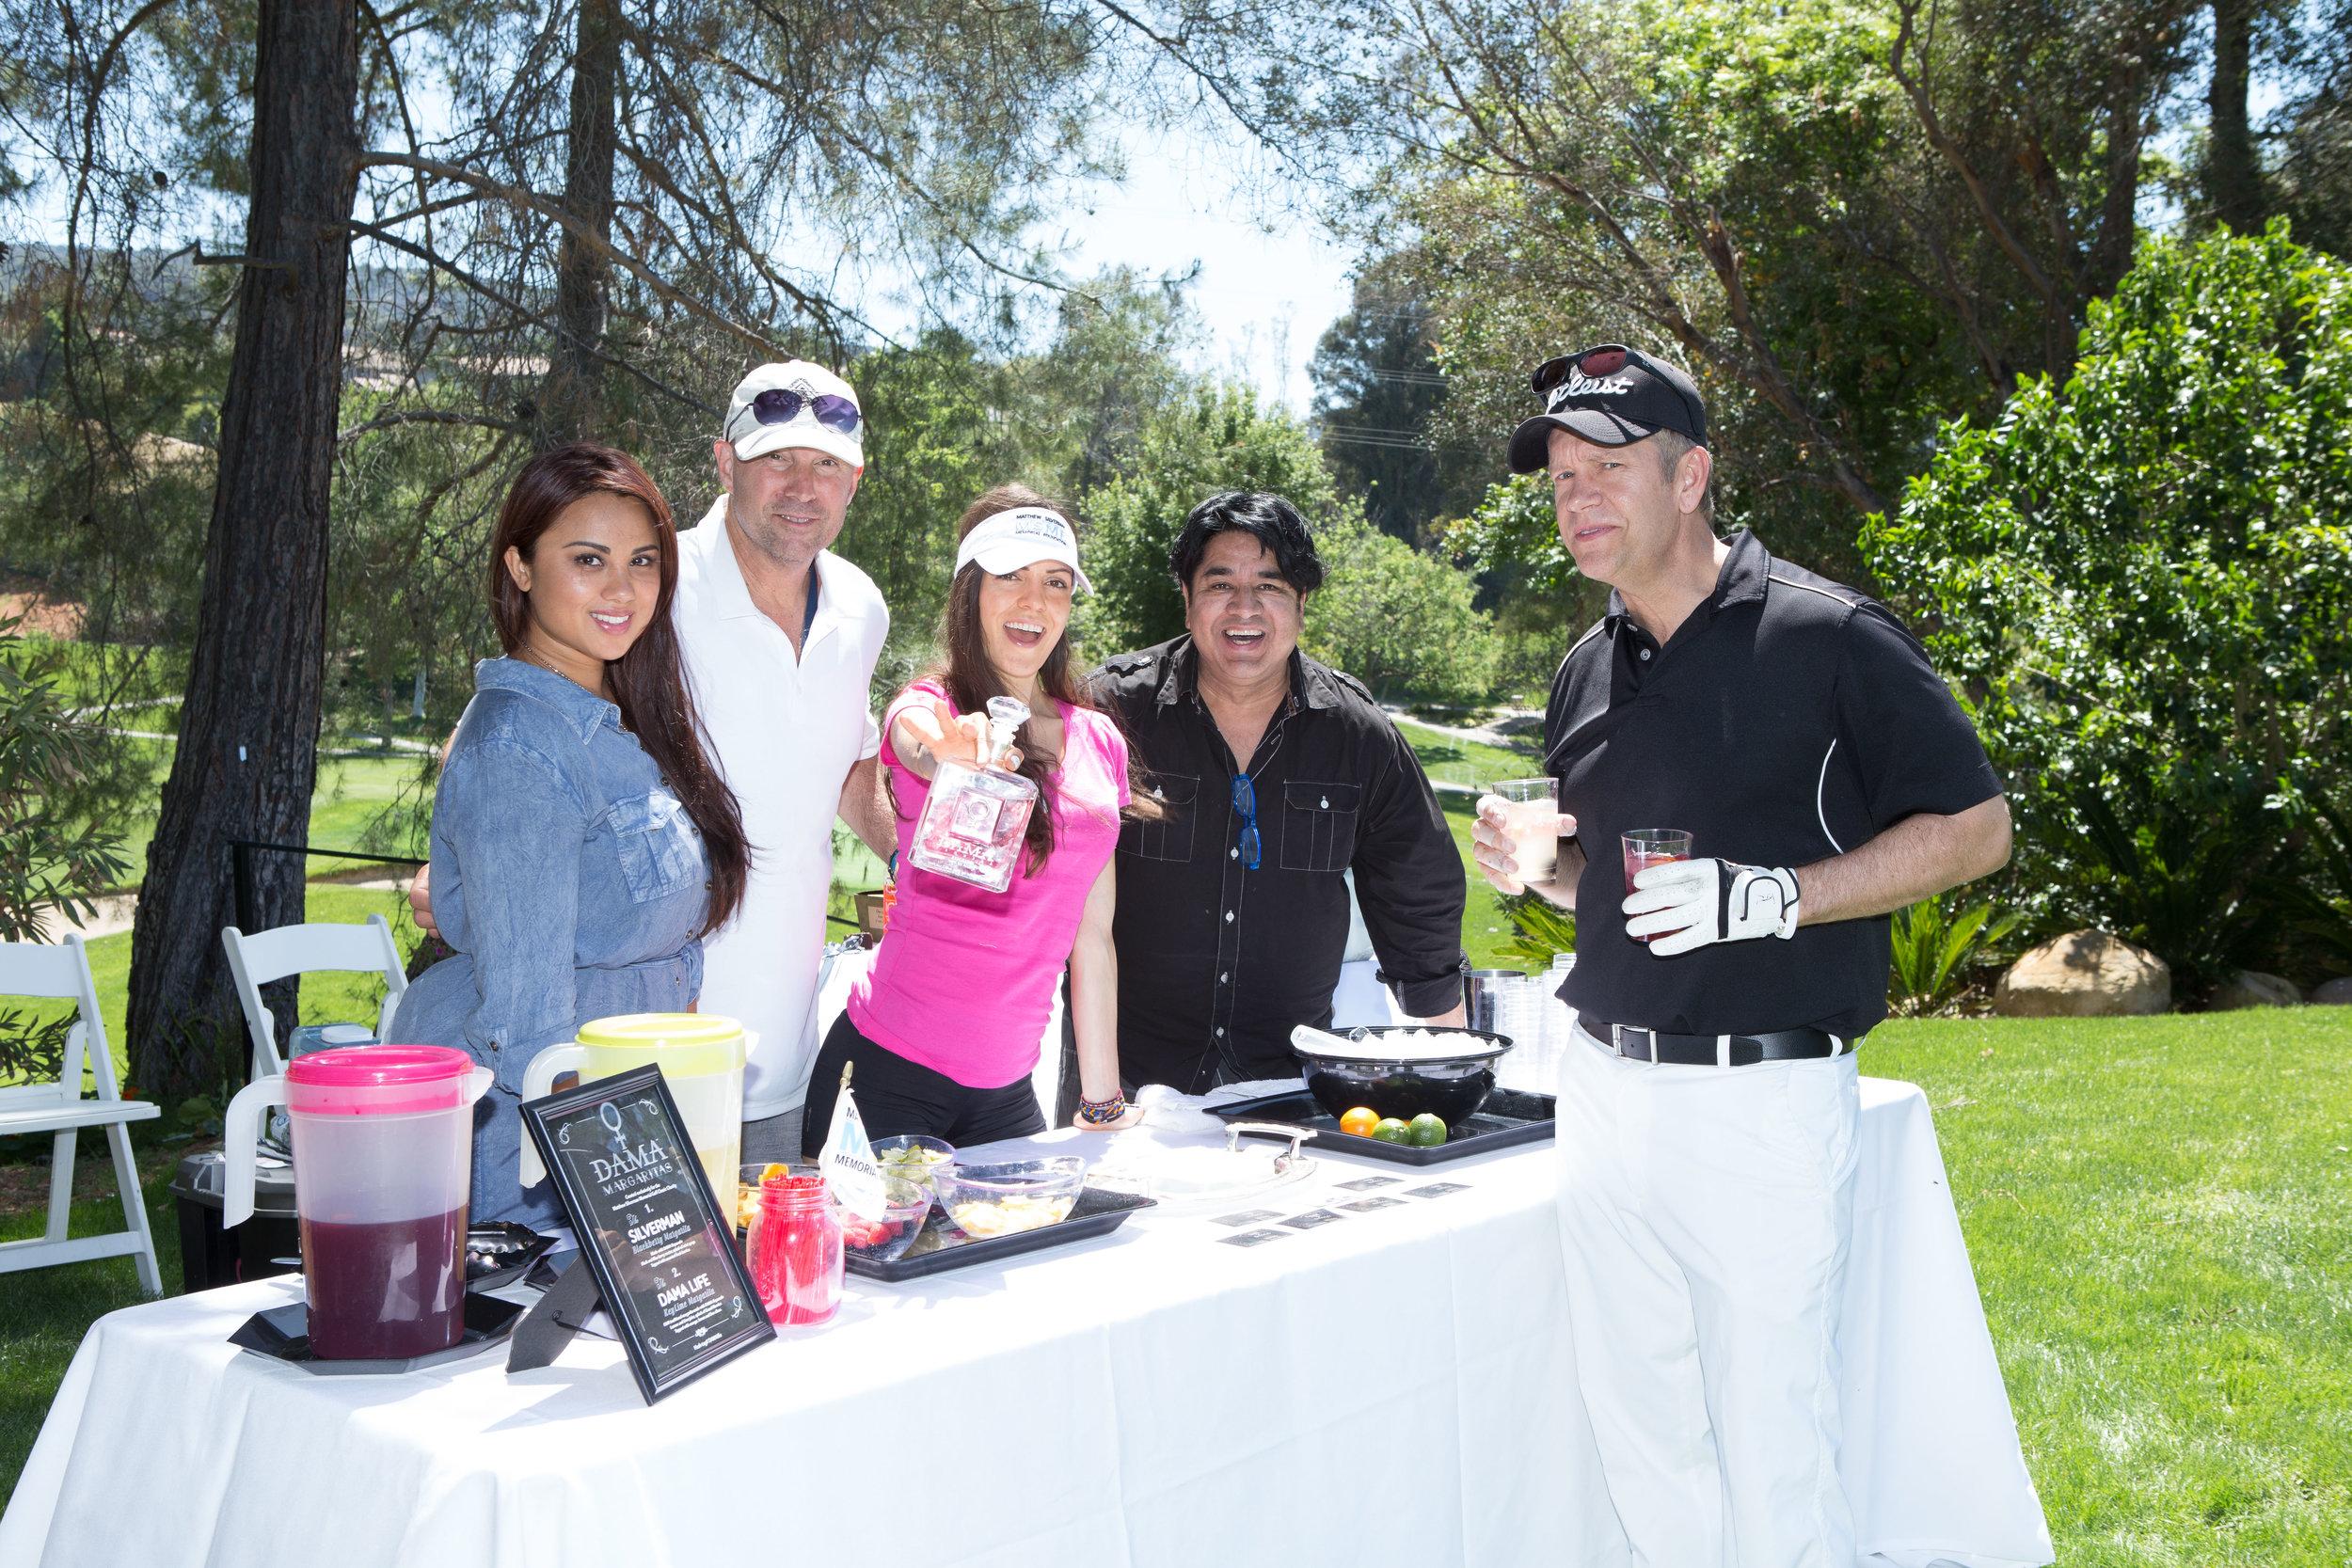 IMG_7999-DAMA & golfers.jpg